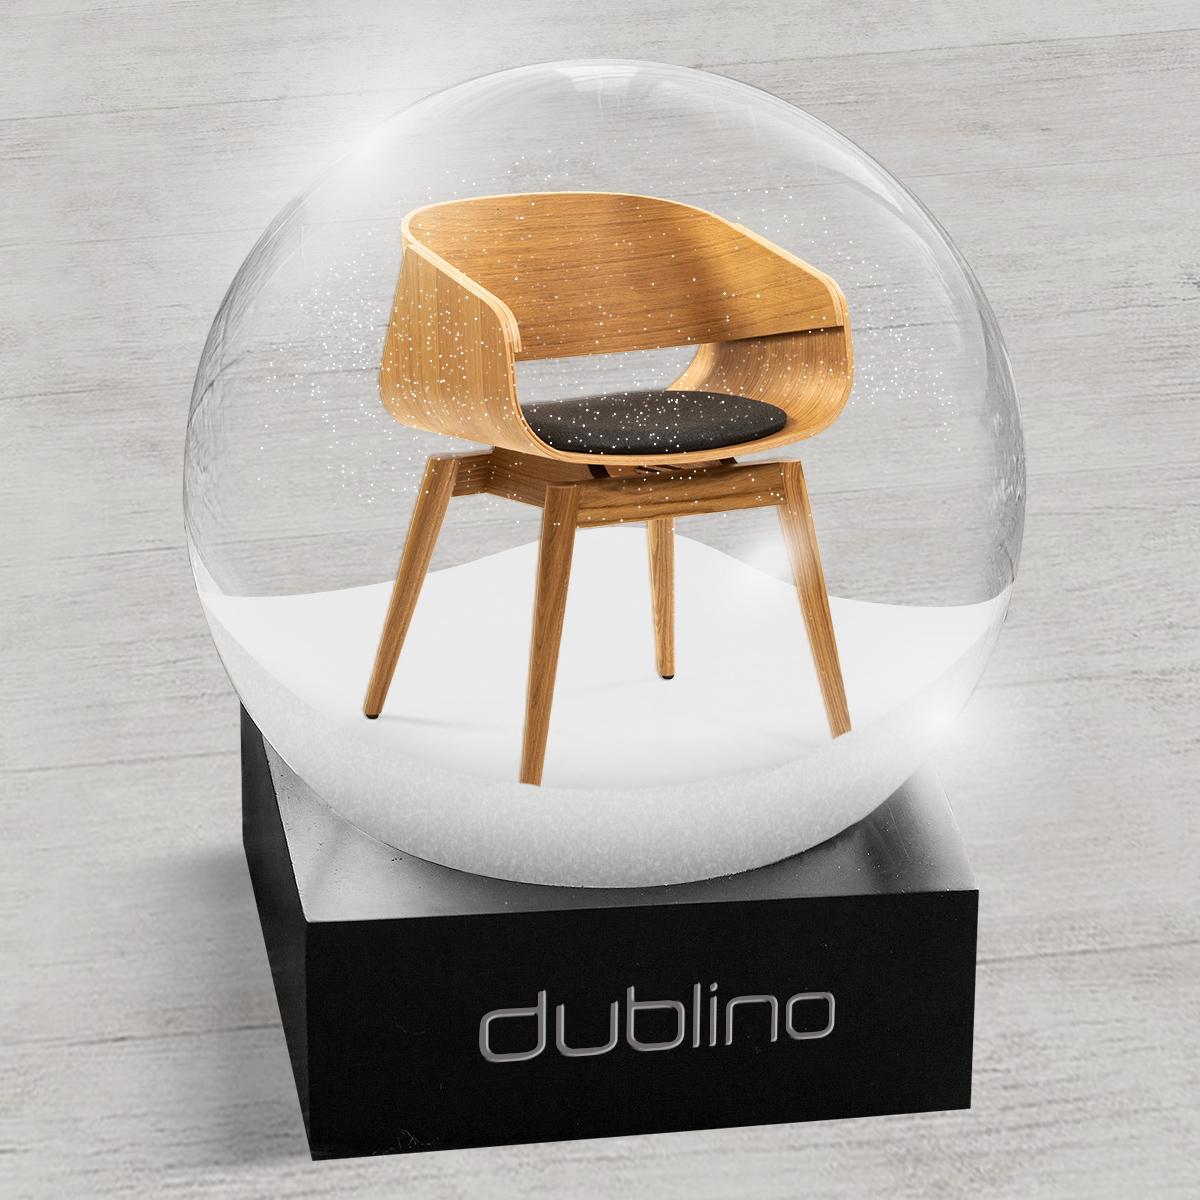 Dublino karácsonyi kreatív 2020 - Doppio Creative